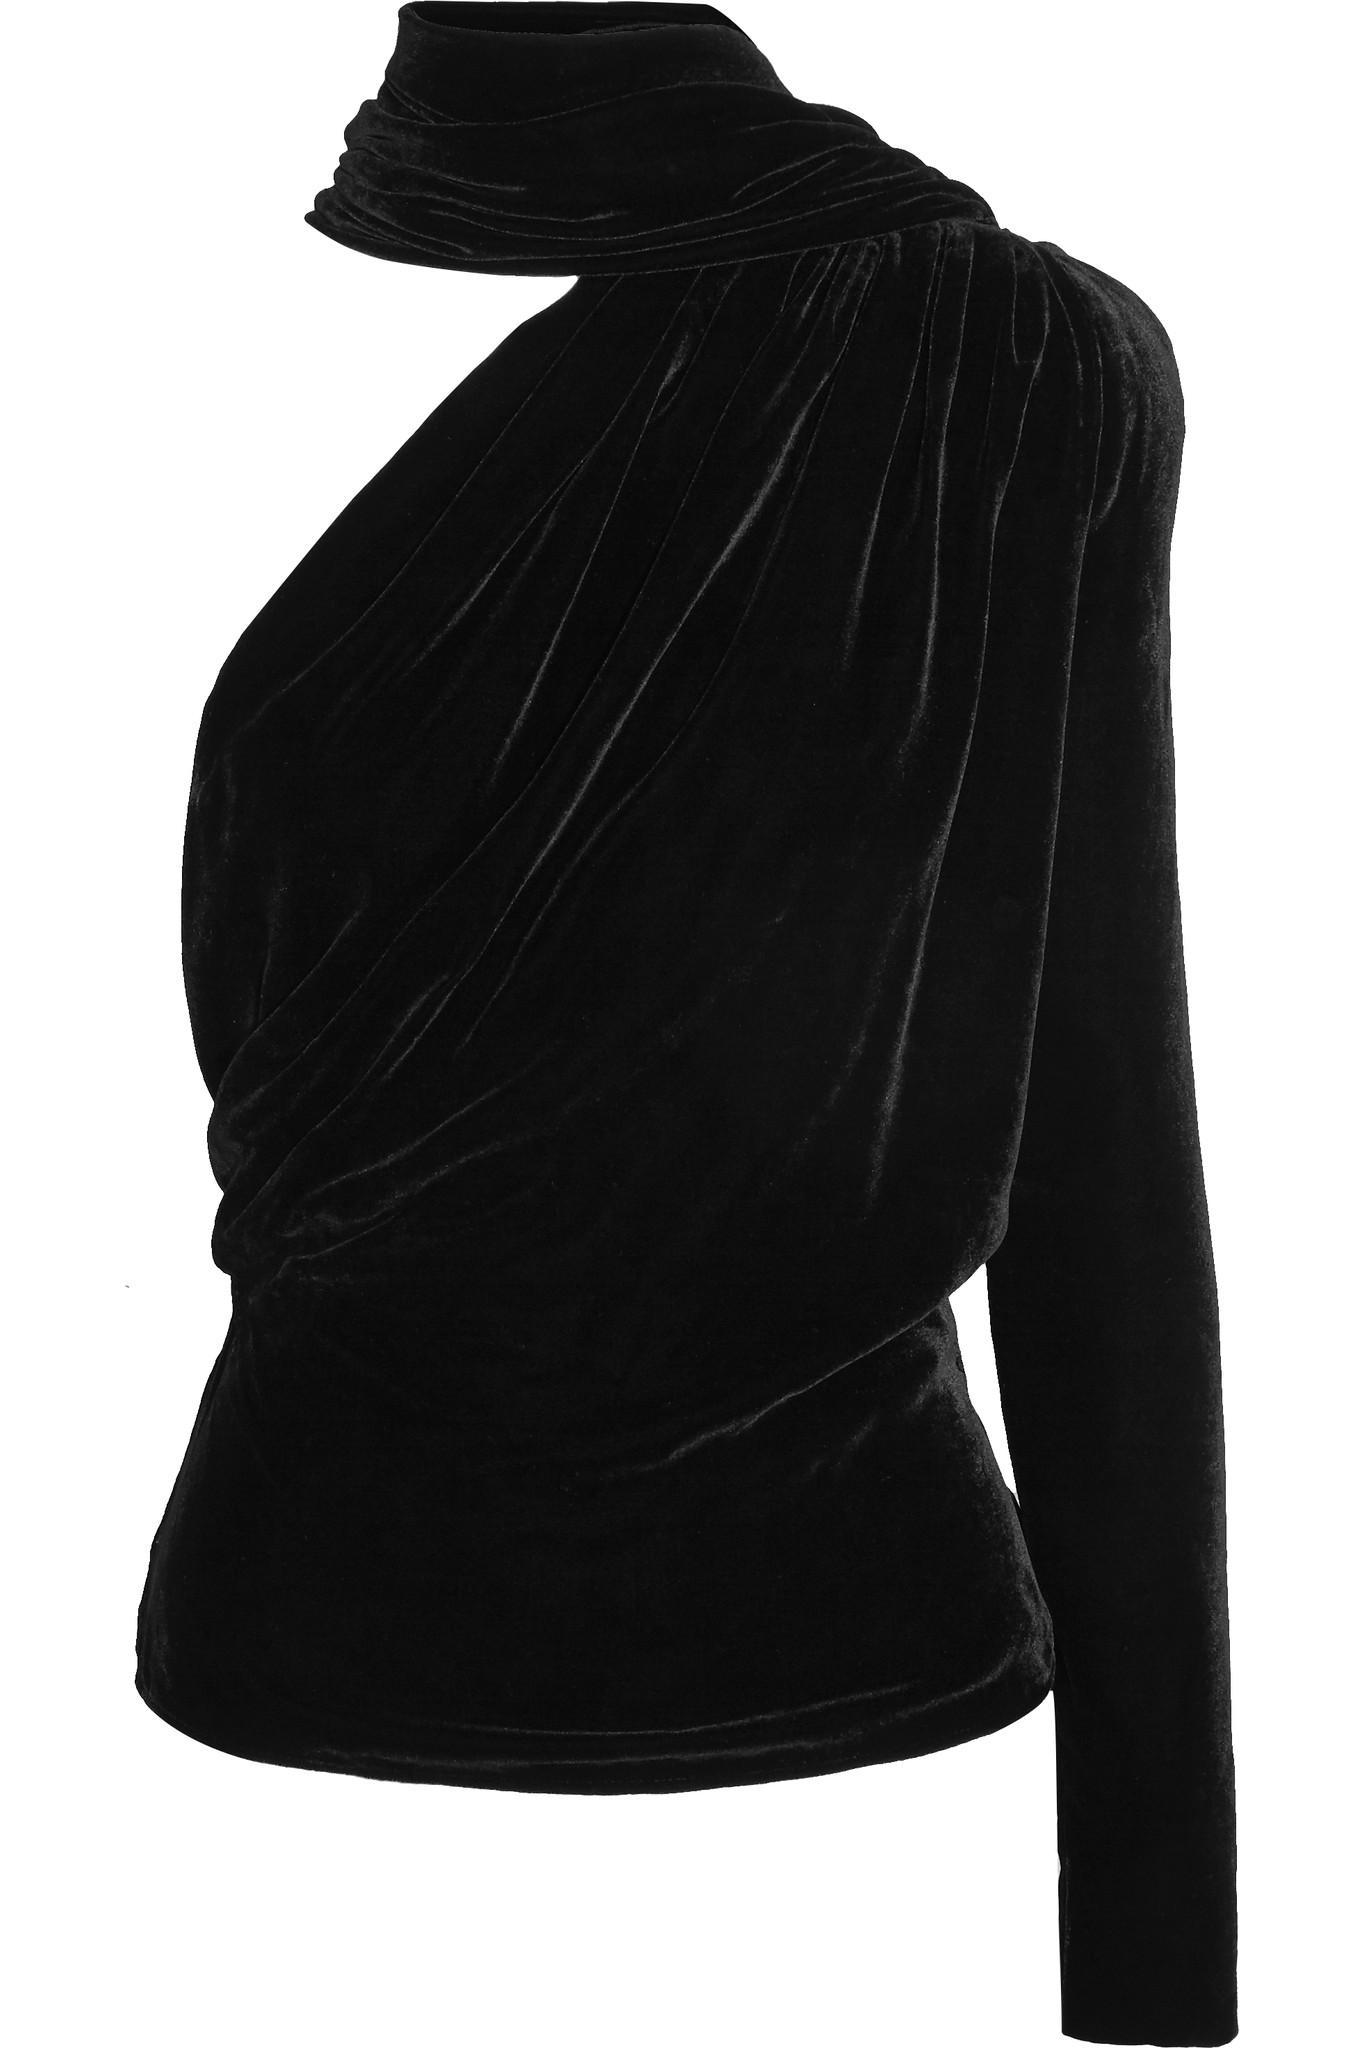 a922c43a20c1a0 Lyst - Gareth Pugh Open-back One-shoulder Velvet Top in Black